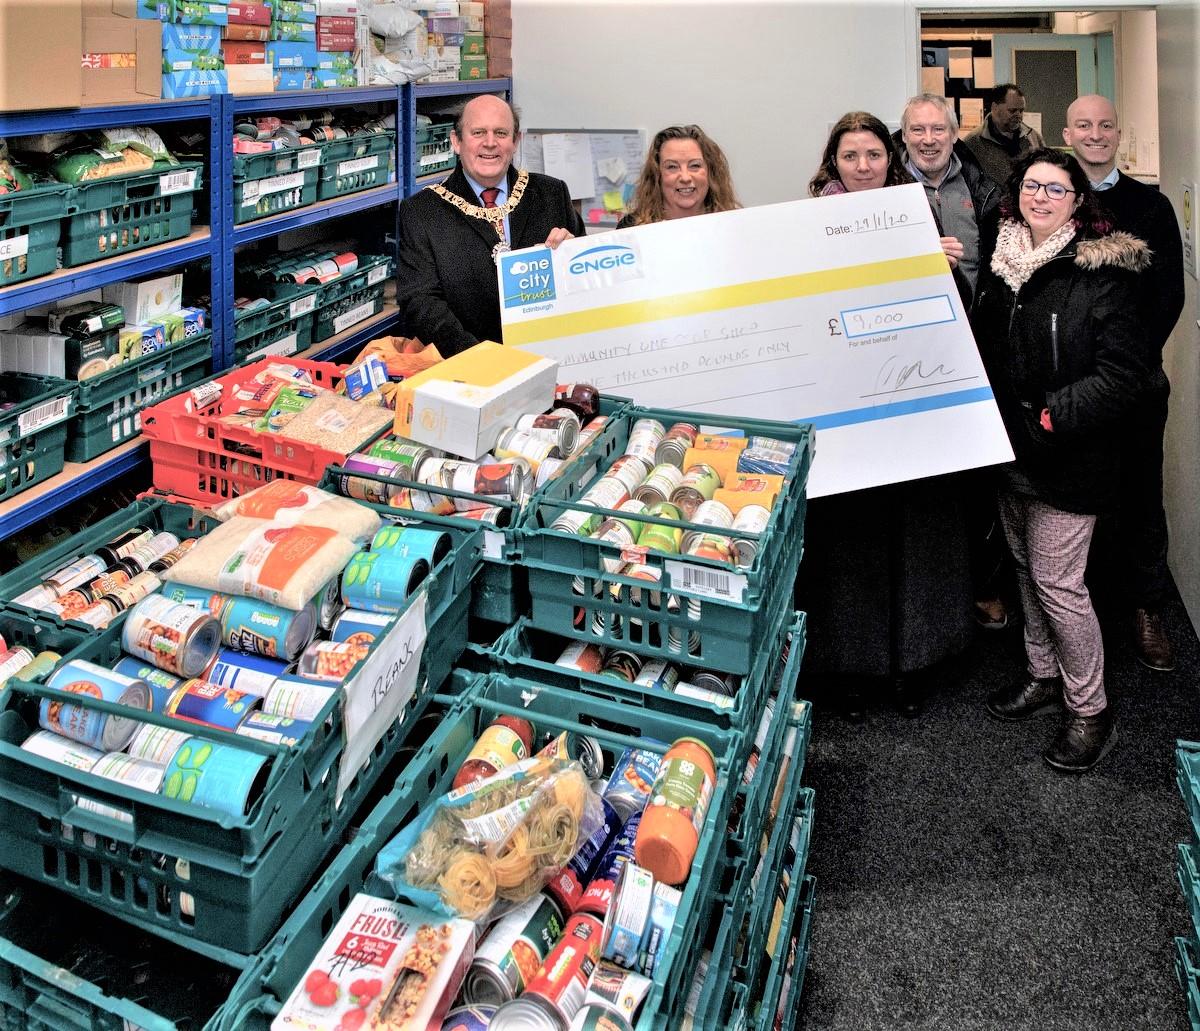 Community Benefit Partnership visit to the 'Community One Stop Shop'